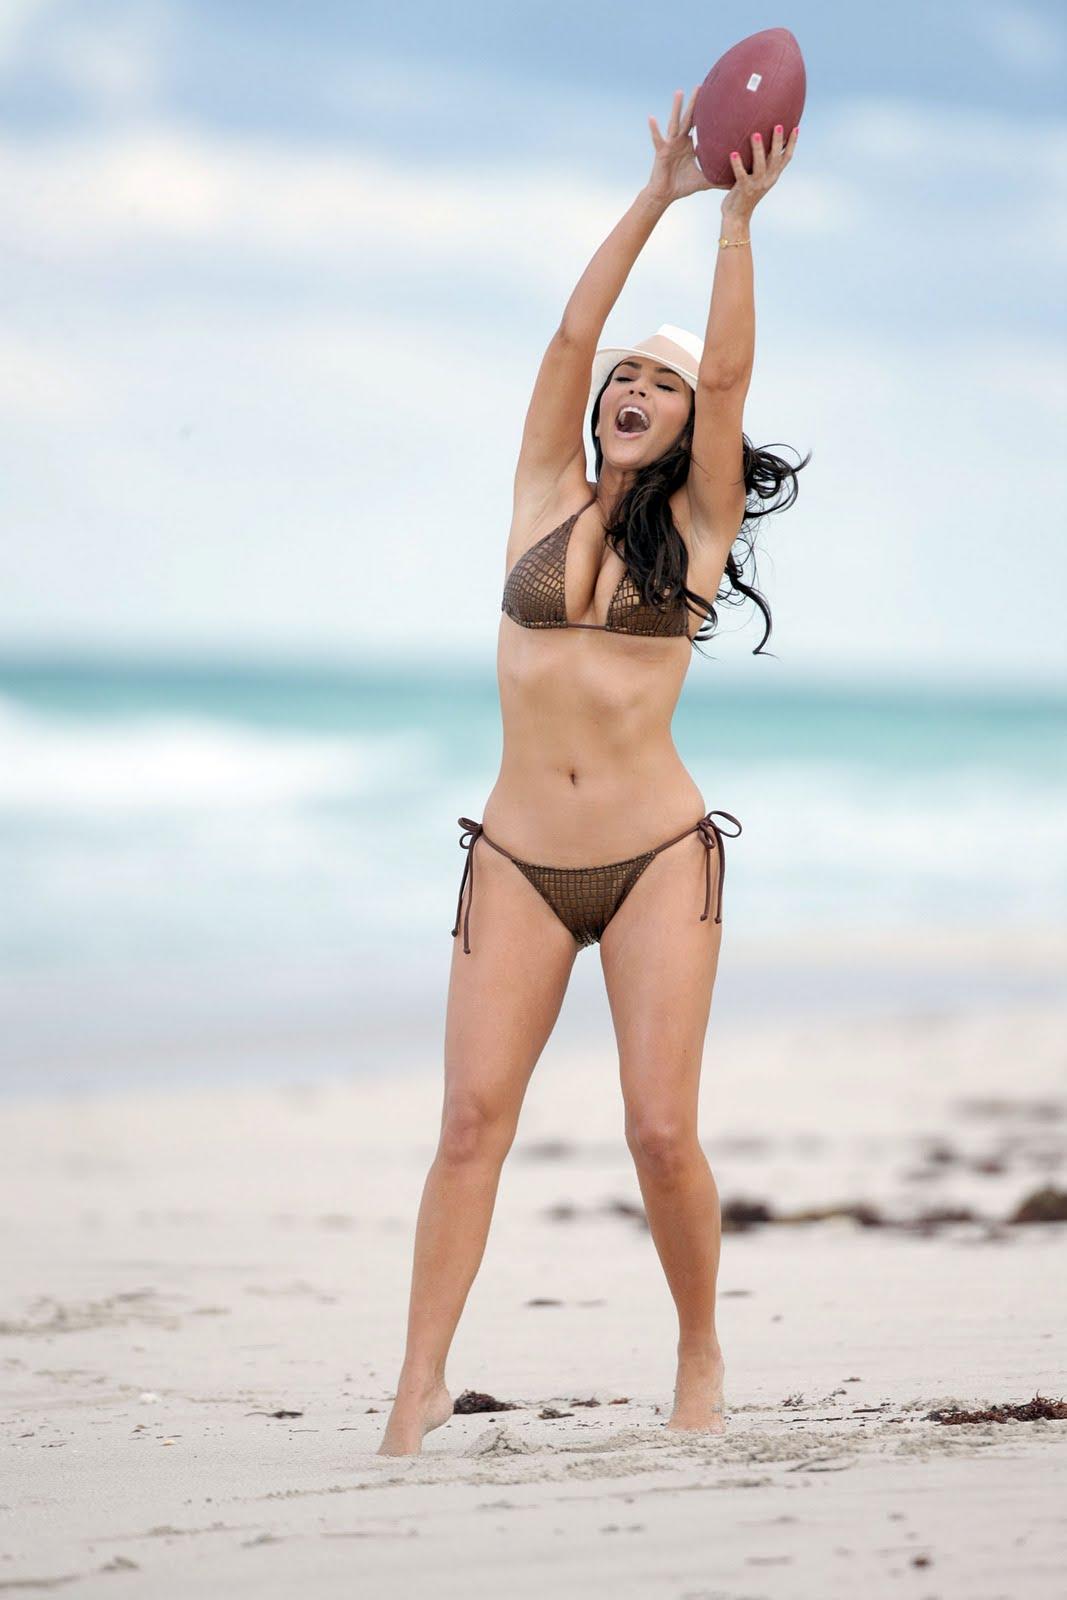 http://1.bp.blogspot.com/_bQ0SqifjNcg/TSFUcBo9JAI/AAAAAAAAfTM/rUwd0wuu-qI/s1600/kim-kardashian-beach-miami-4.jpg